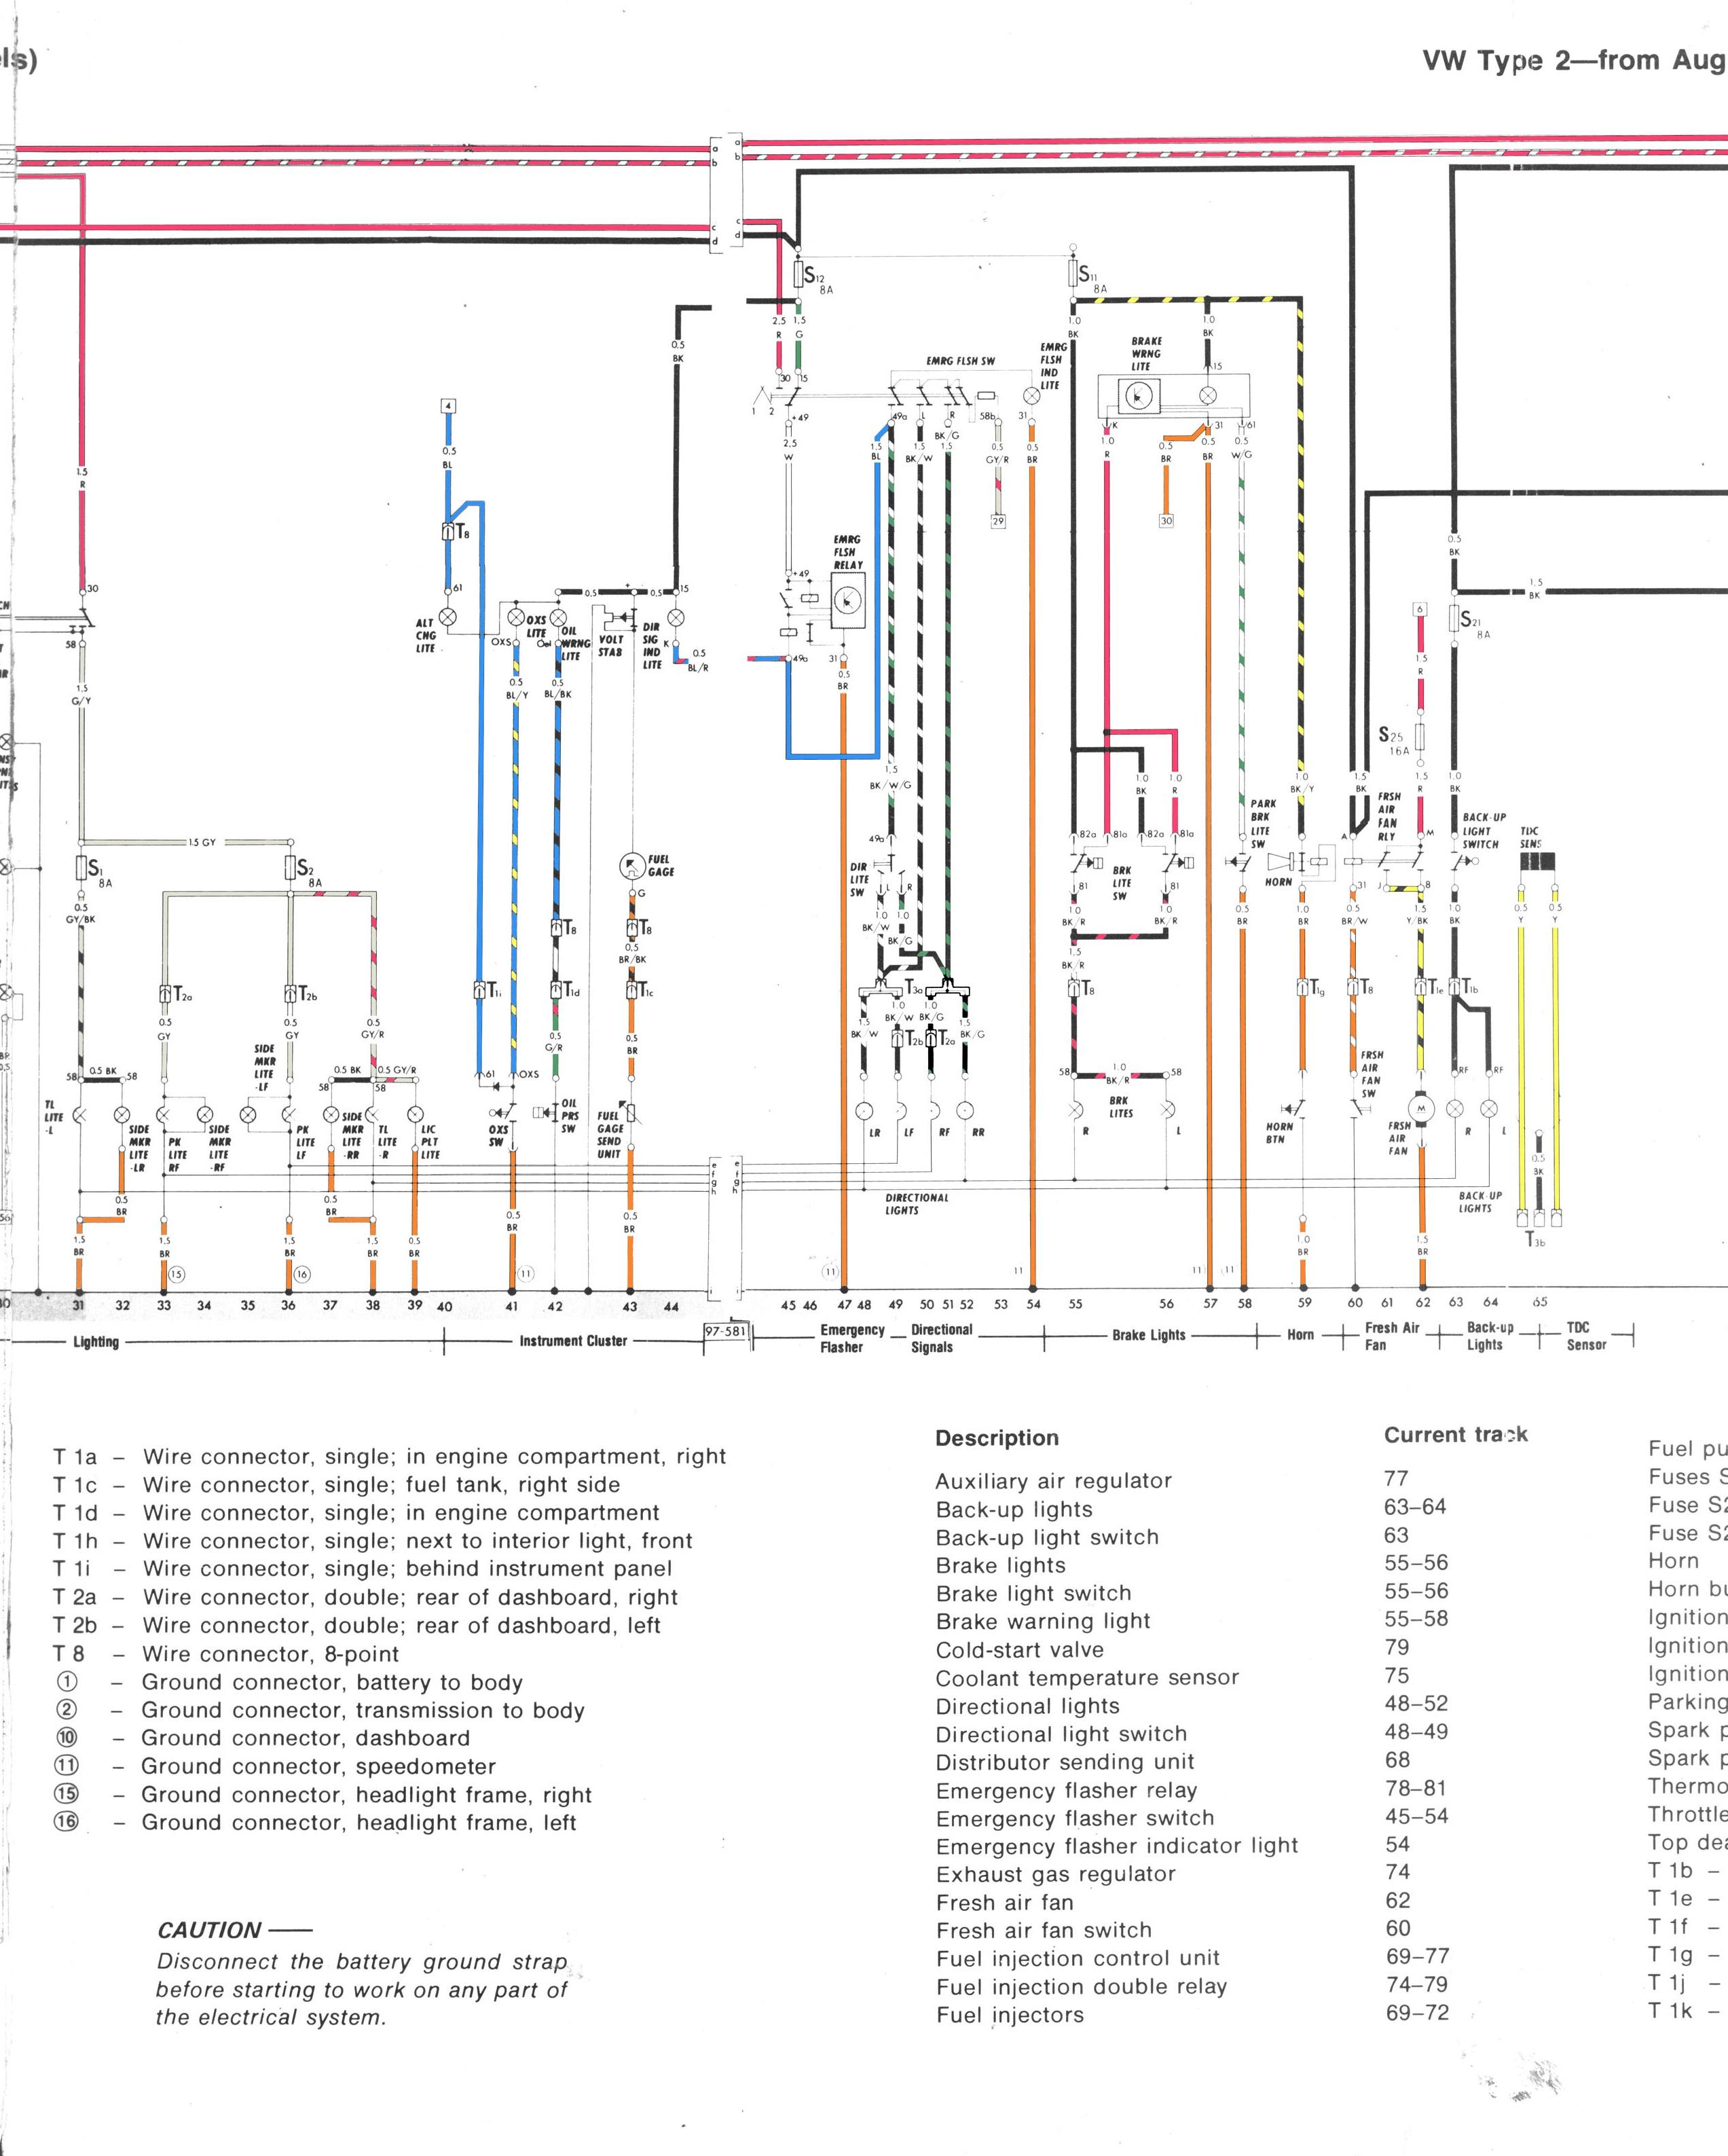 vw wiring diagrams. Black Bedroom Furniture Sets. Home Design Ideas